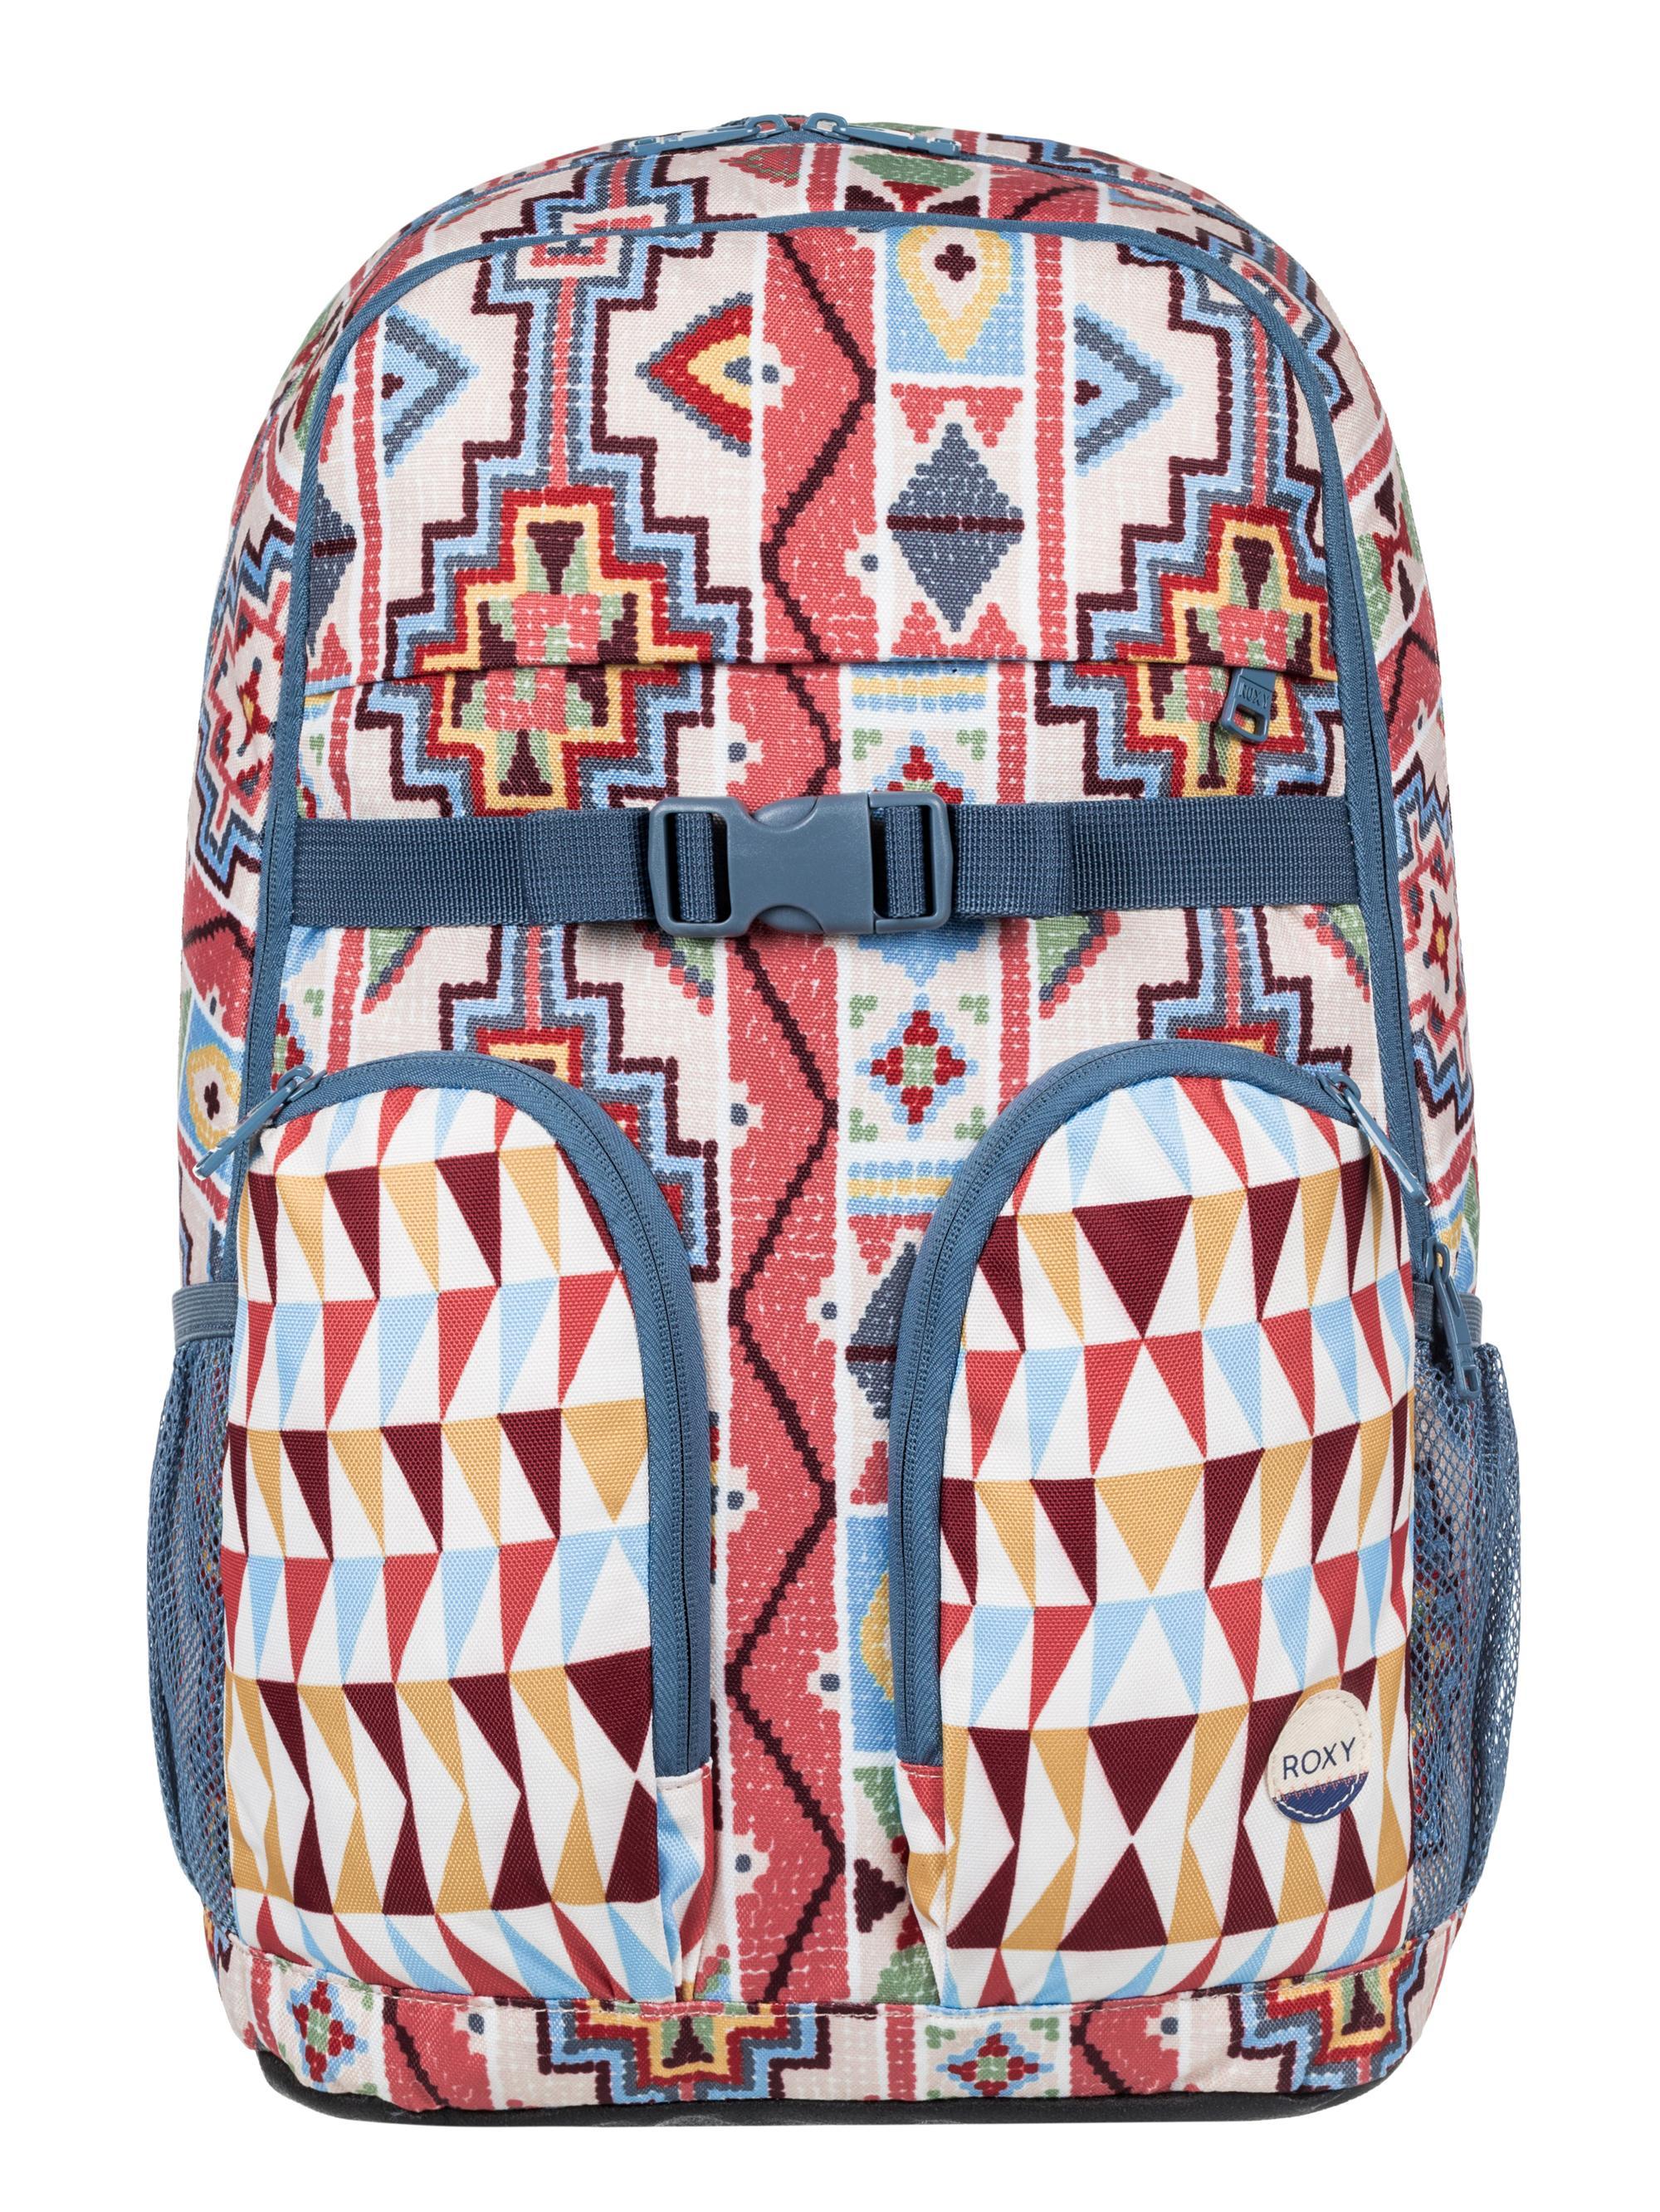 9fe36b26d6715 Plecak szkolny Take It Slow, Roxy ERJBP03545-NDS7 plecaki :: Sklep Kleks